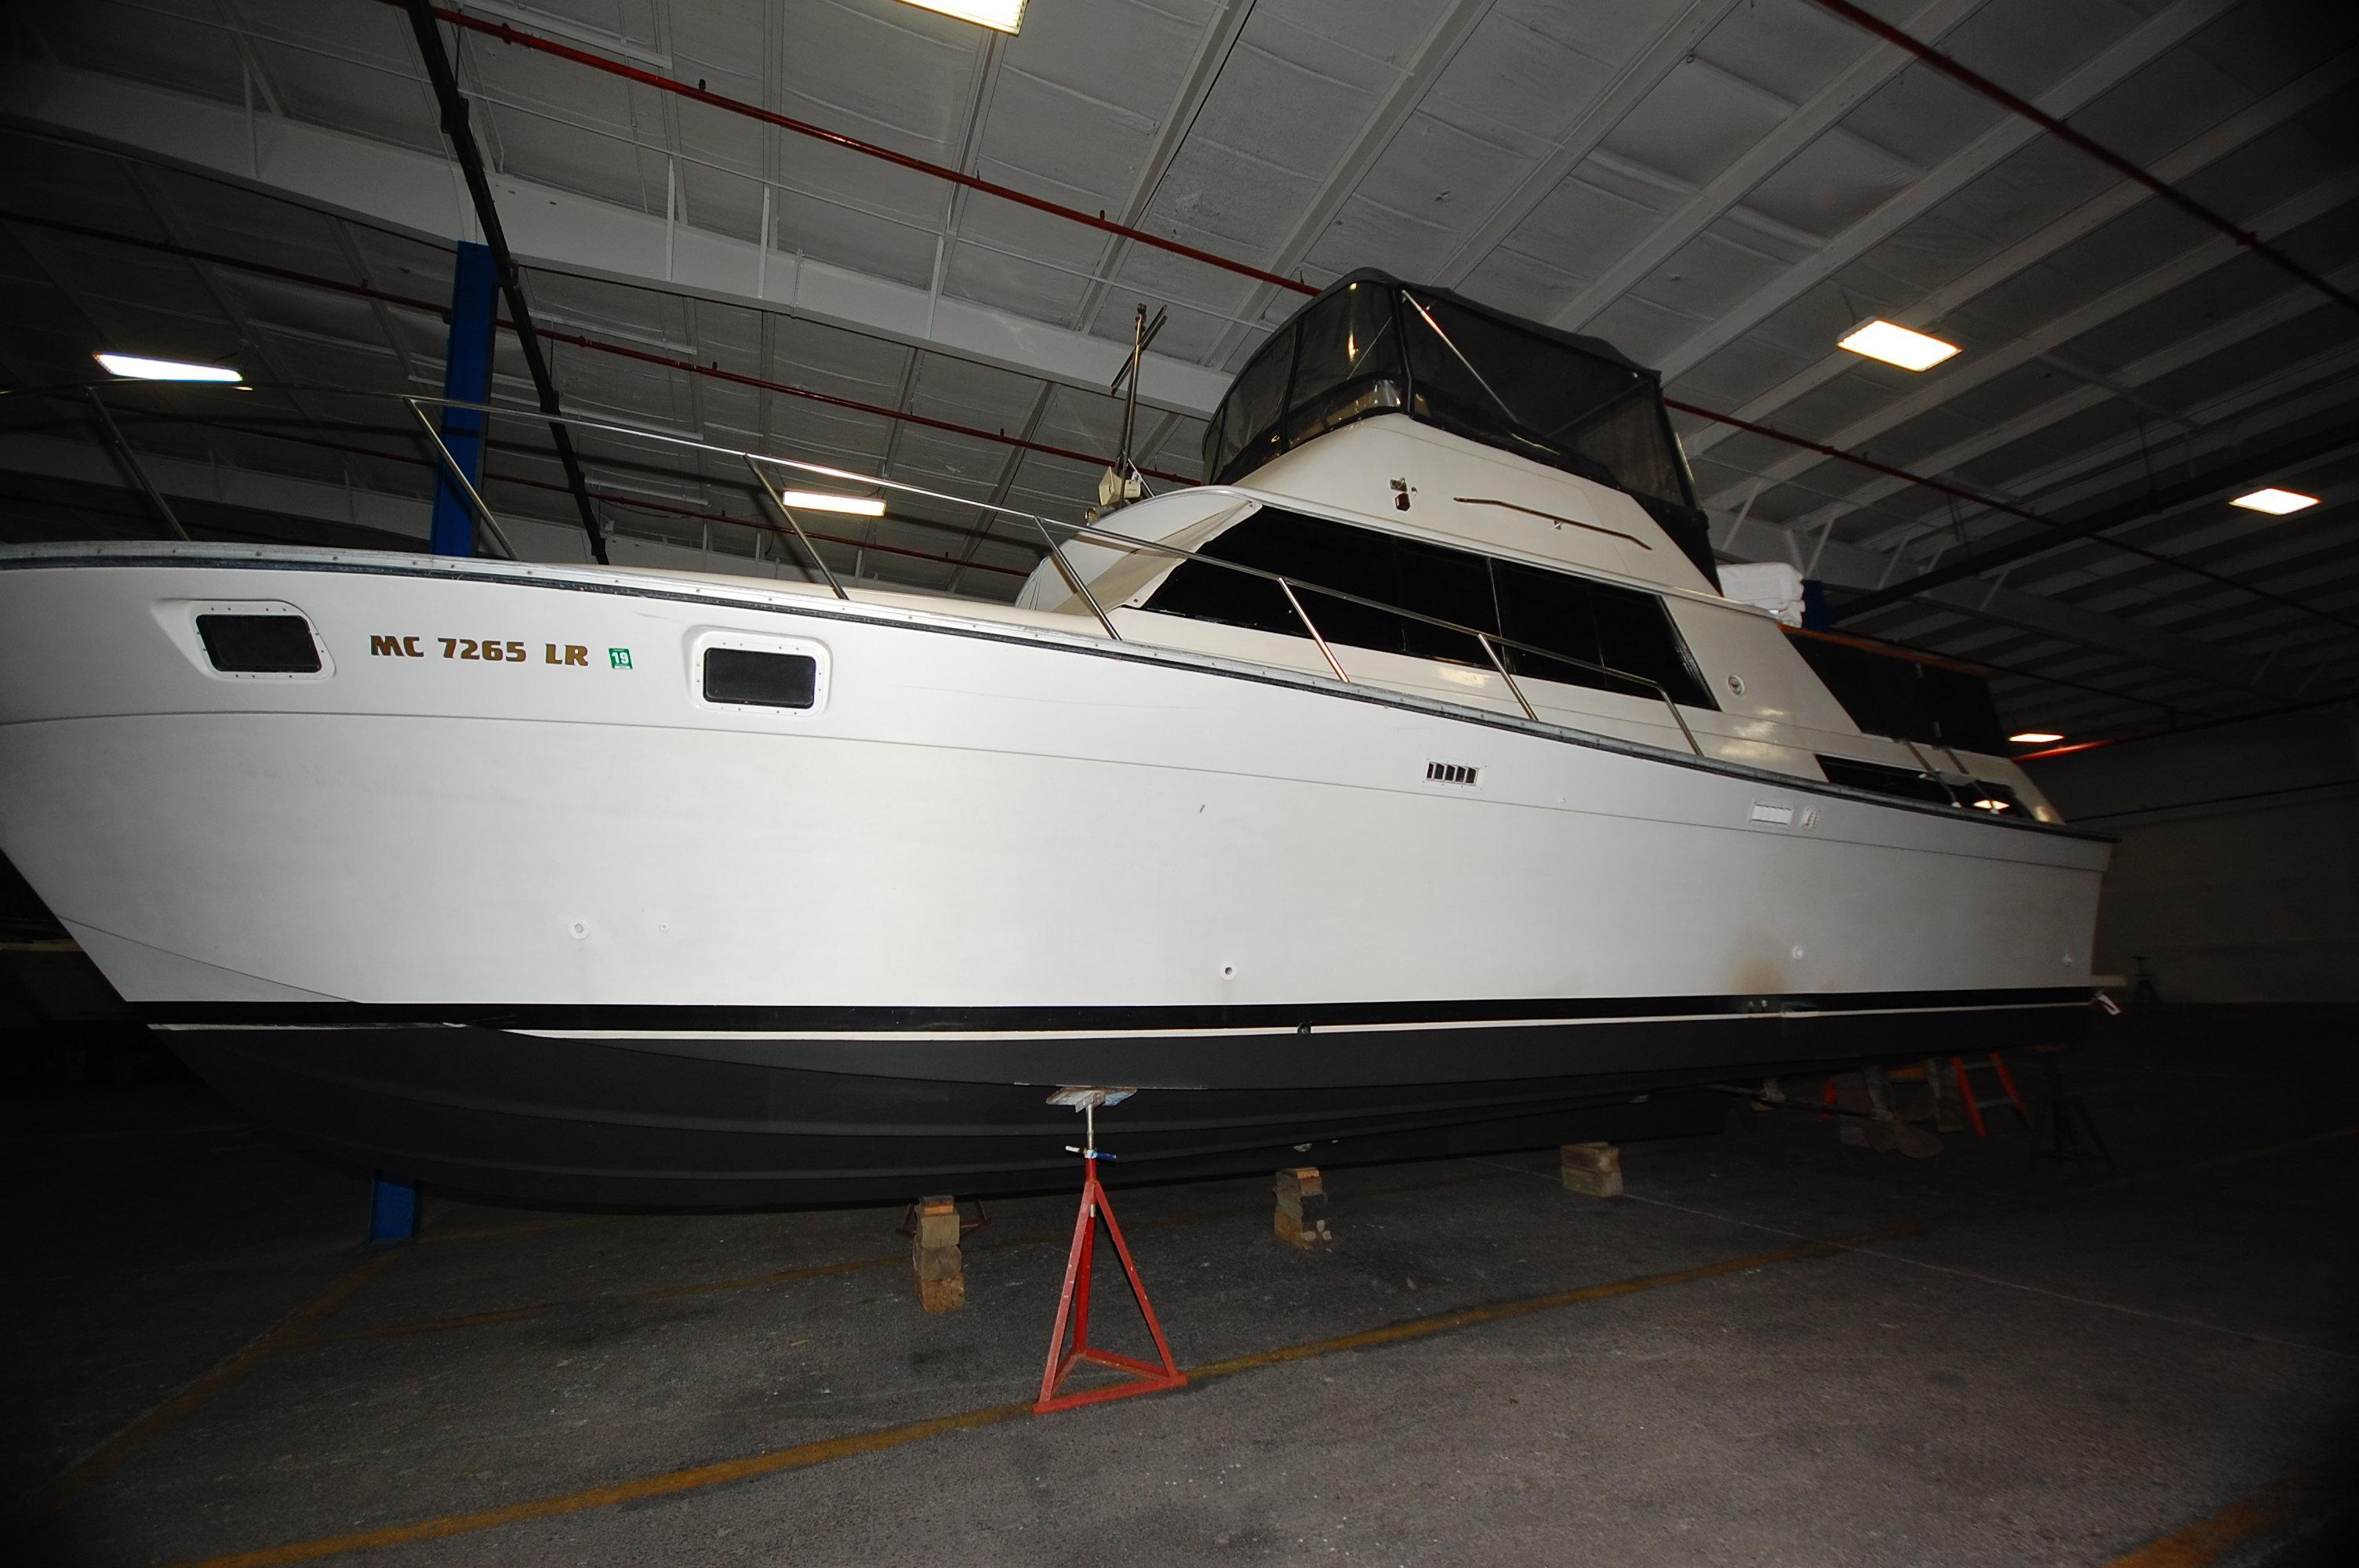 O 6589 HG Knot 10 Yacht Sales